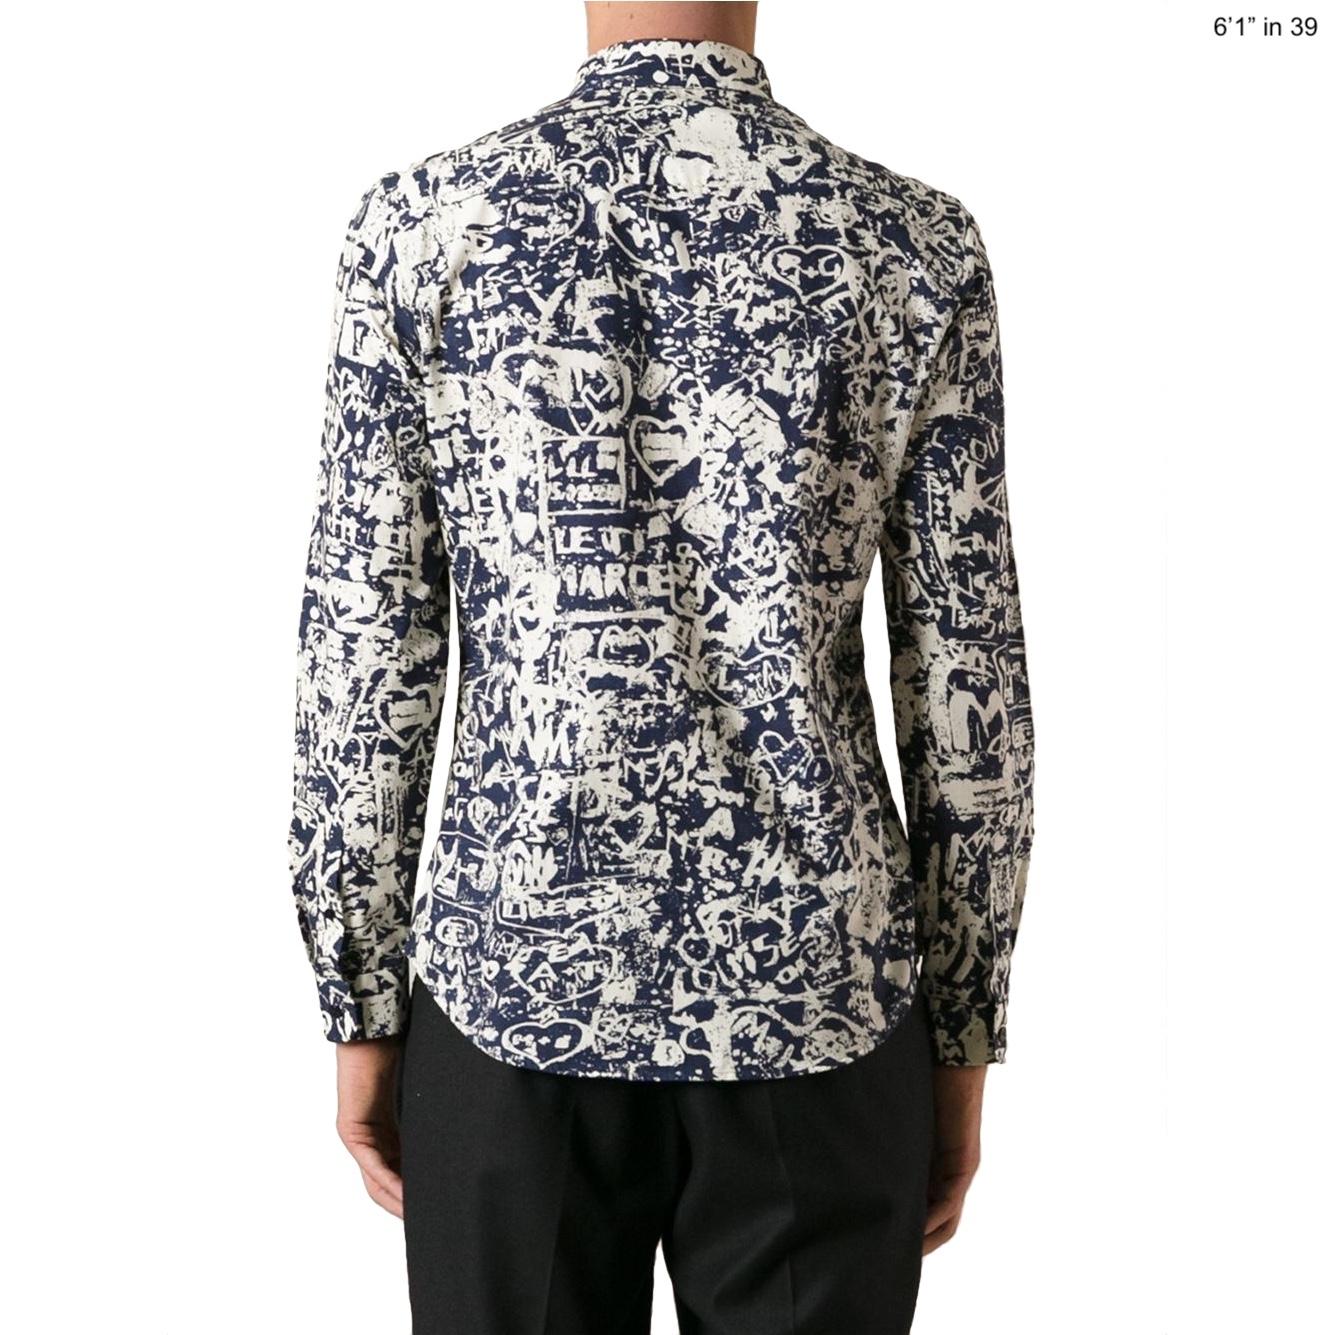 carven-blue-graffiti-print-shirt-product-1-22473397-0-071783662-normal.jpg